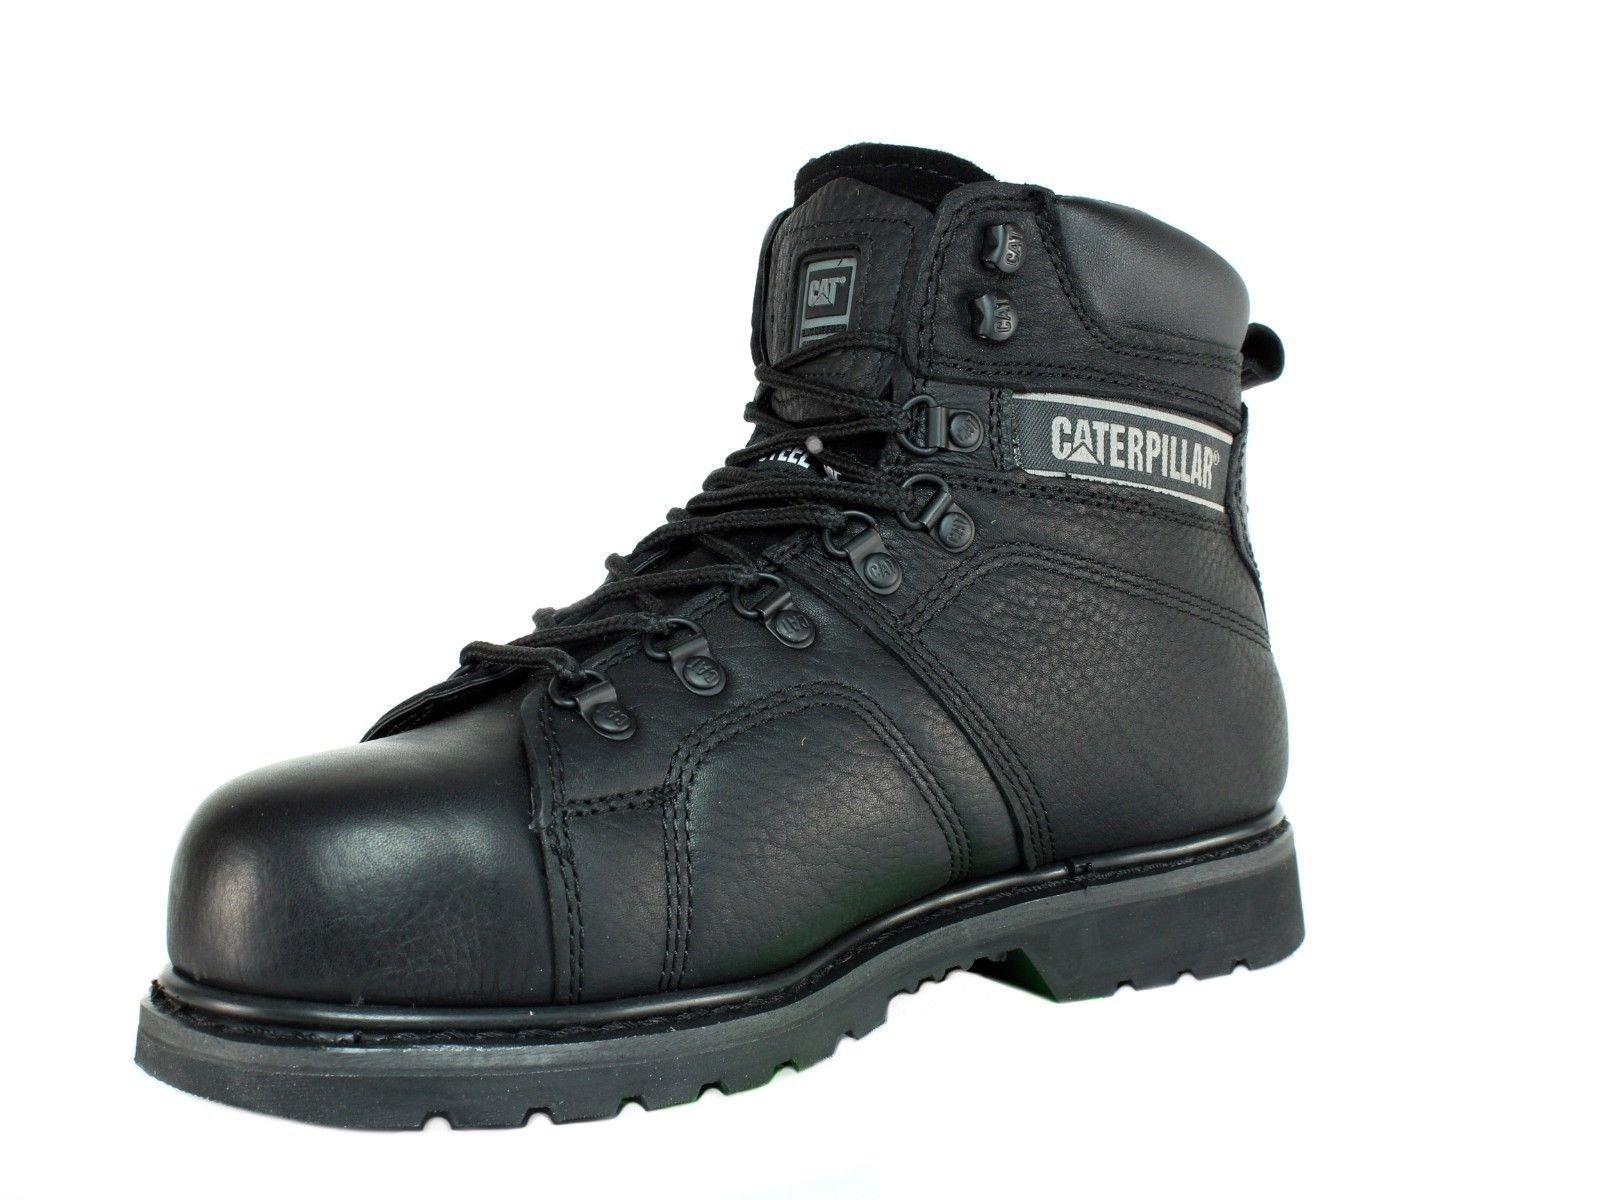 Caterpillar SureGrip Mens Silverton SG Black Slip Resistant Work Boots 12M by Caterpillar (Image #7)